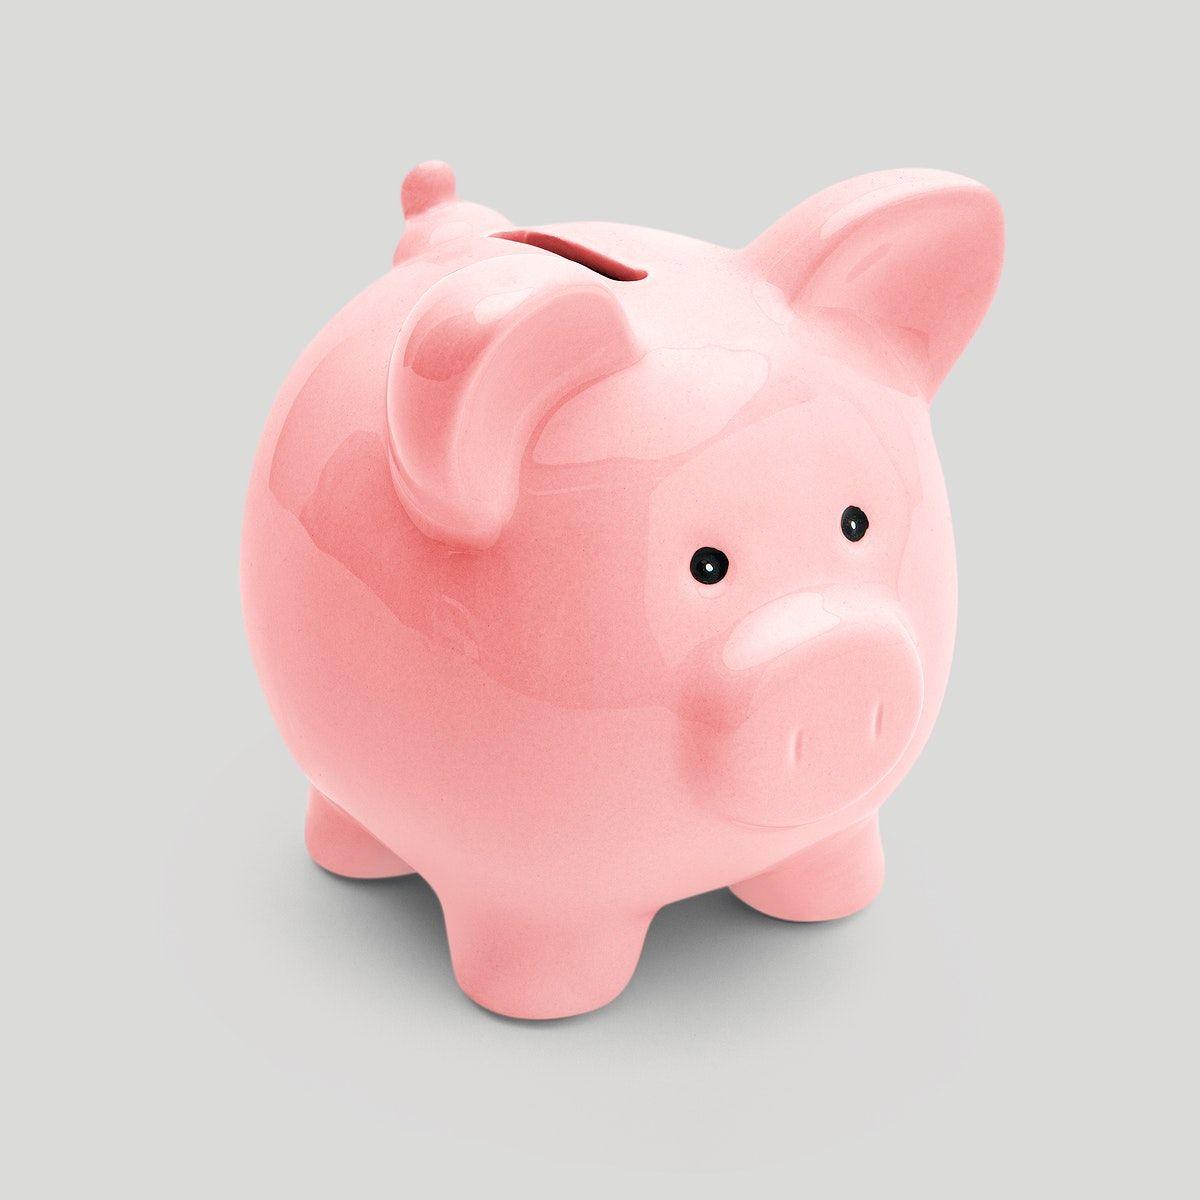 Download Premium Illustration Of Pink Piggy Bank Sticker Mockup On A Gray Pink Piggy Bank Piggy Bank Piggy